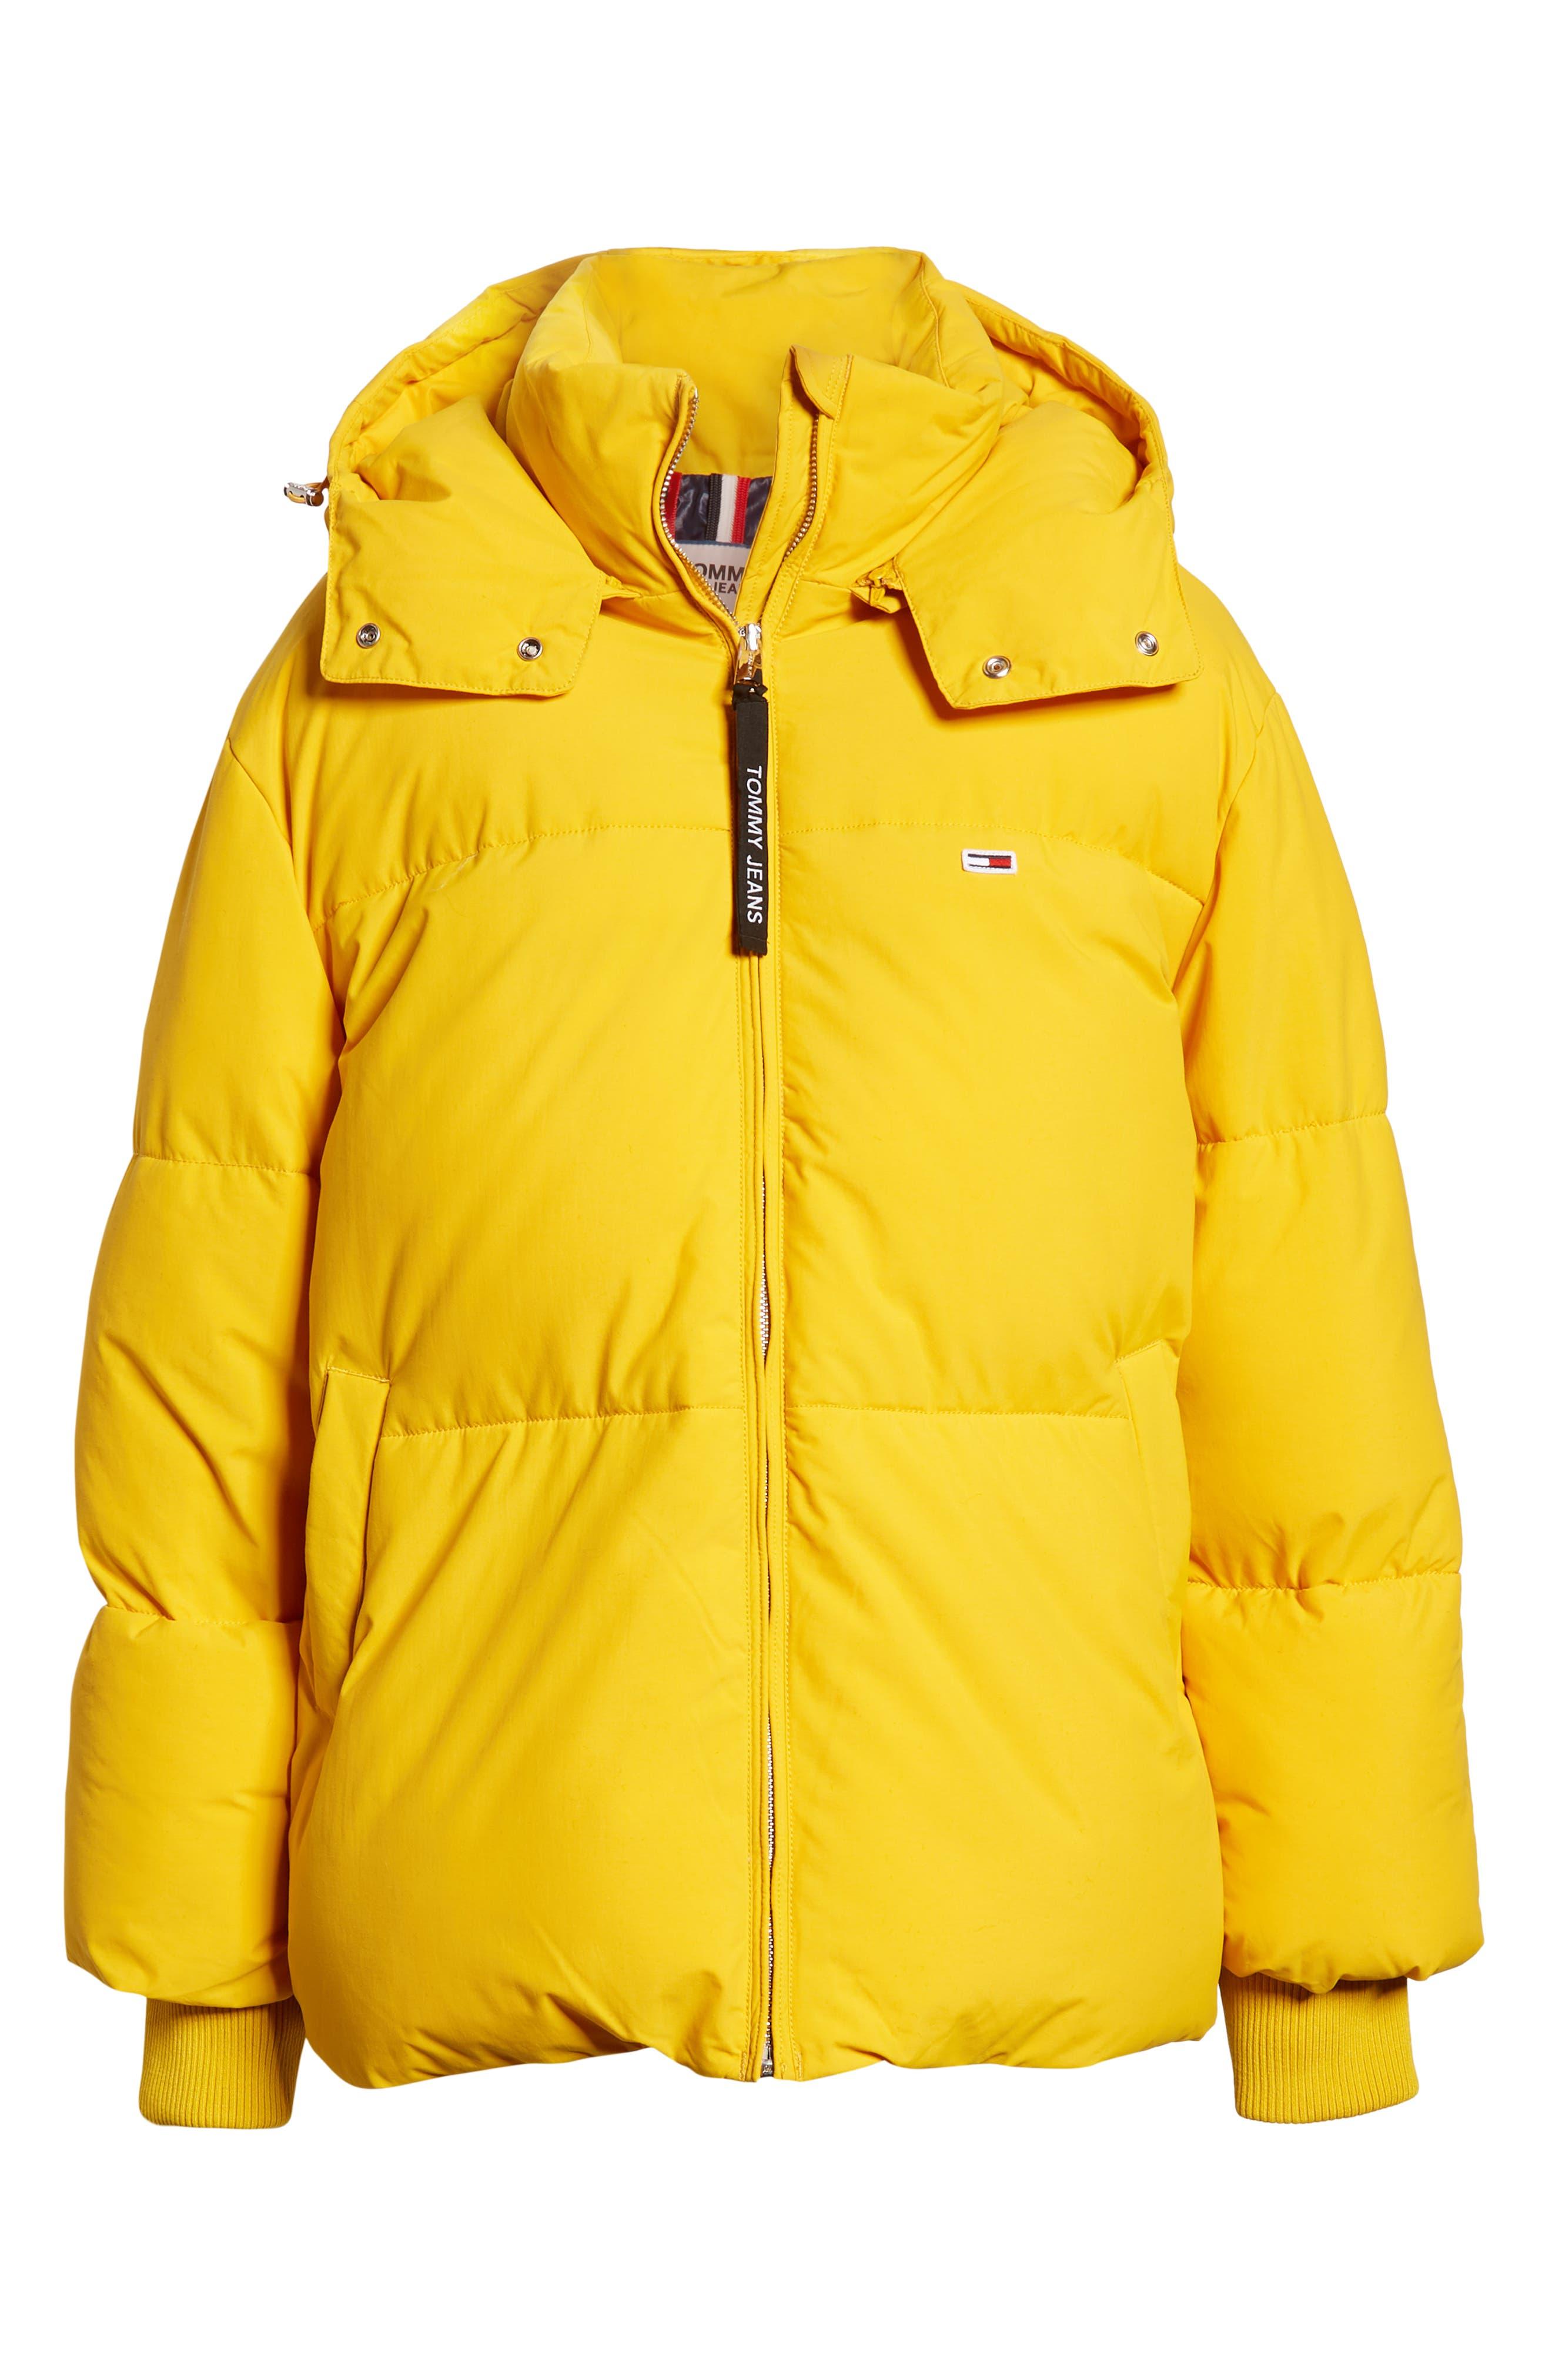 TJW Oversized Puffer Jacket,                             Alternate thumbnail 6, color,                             MANGO MOJITO